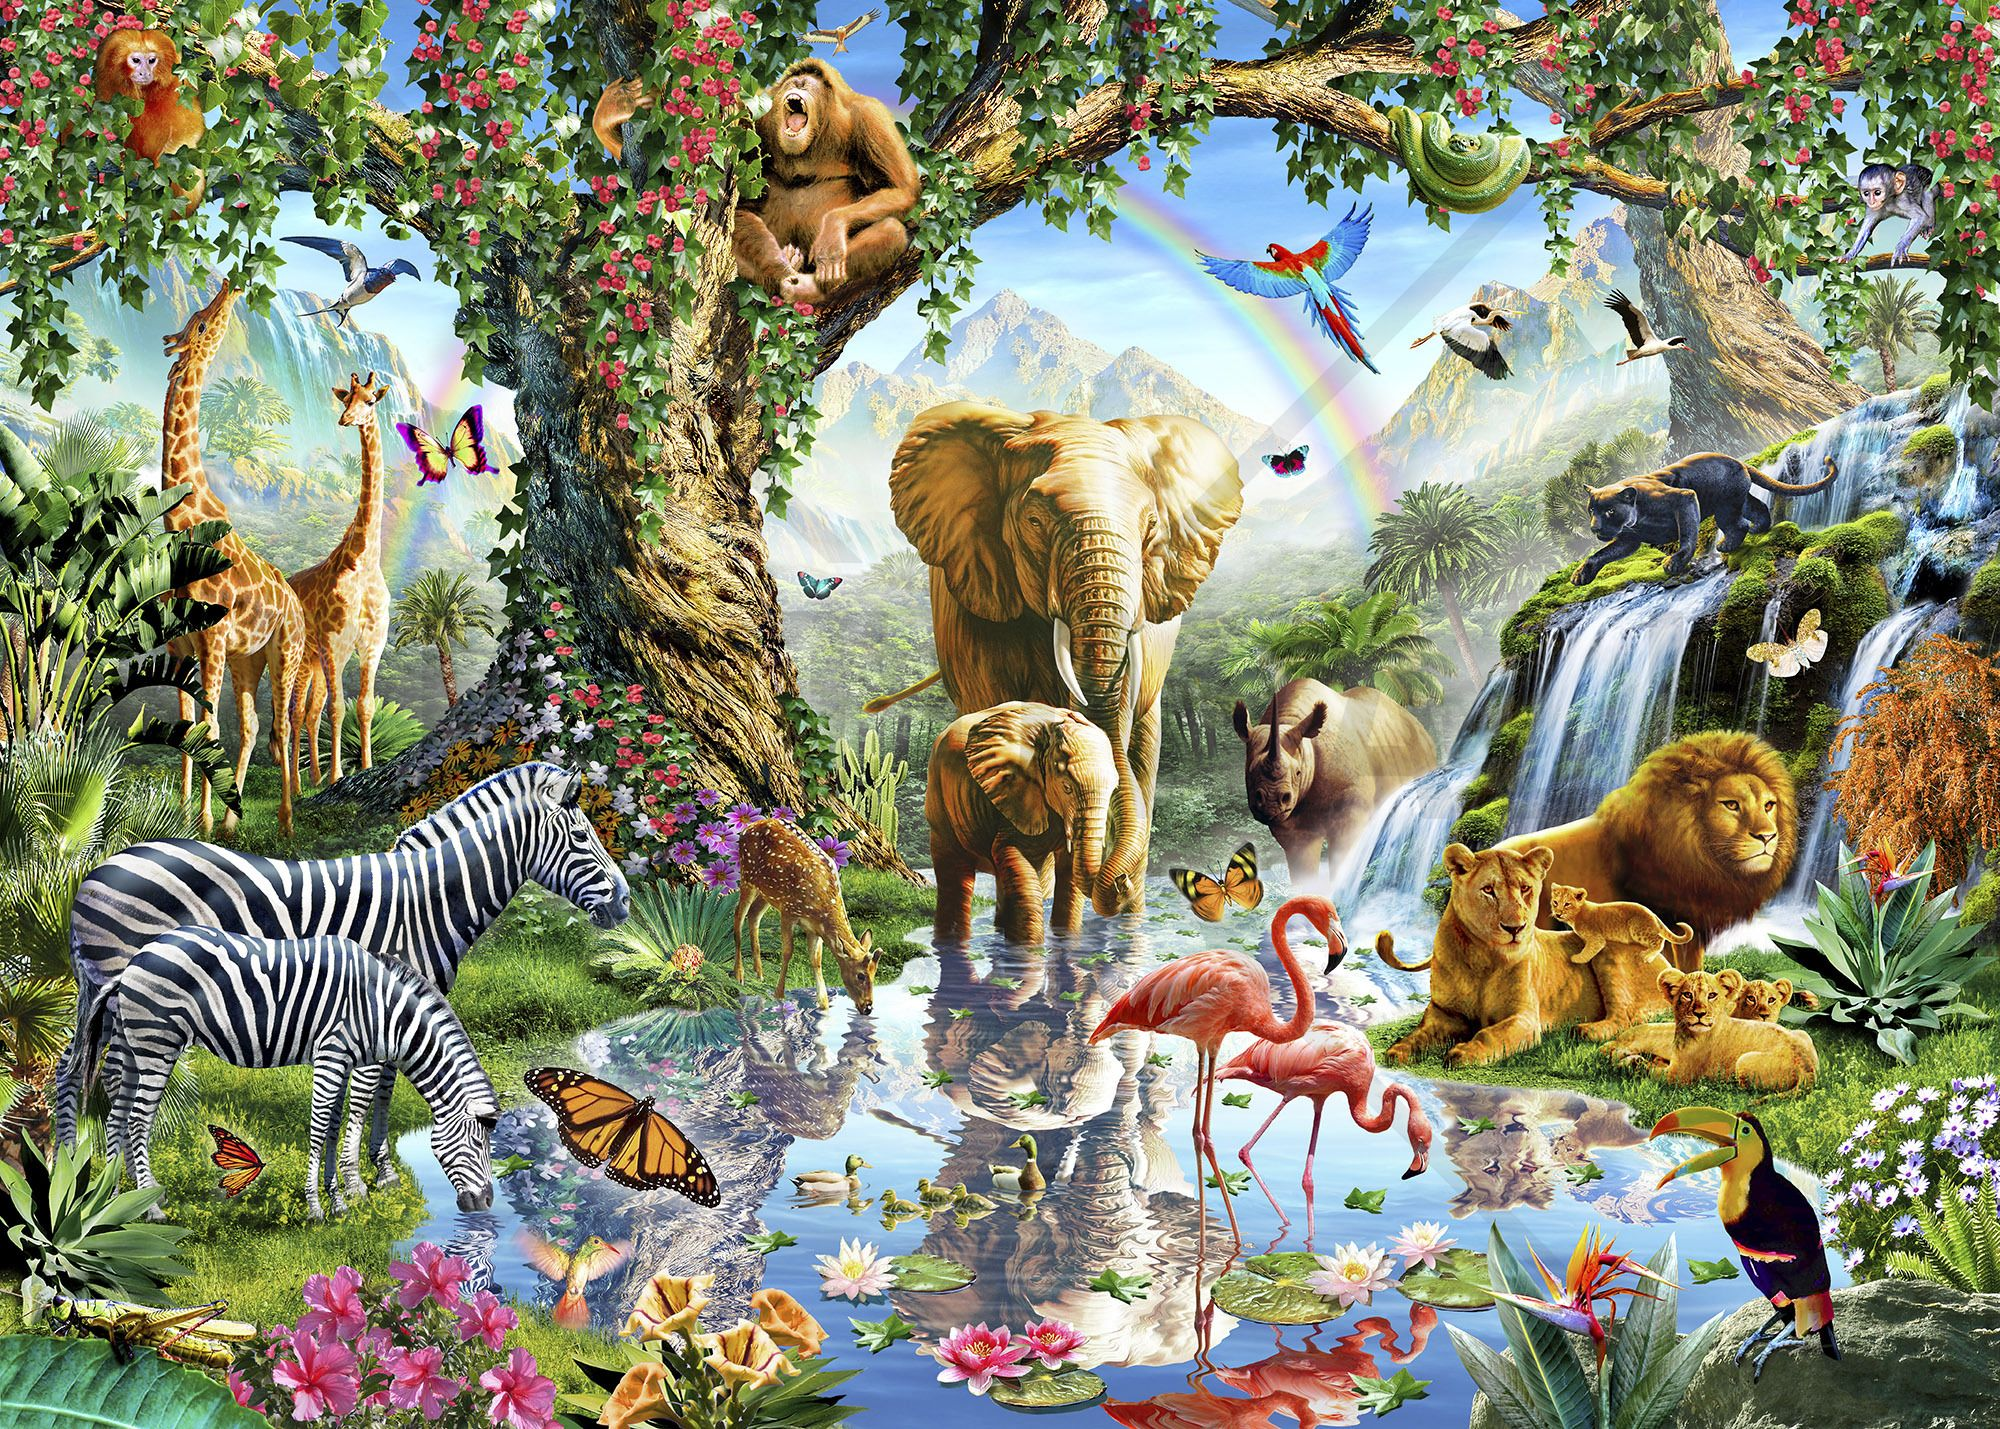 Jungle Lake with wild Animals - Decoration Murale & Papier Peint Photo - Photowall